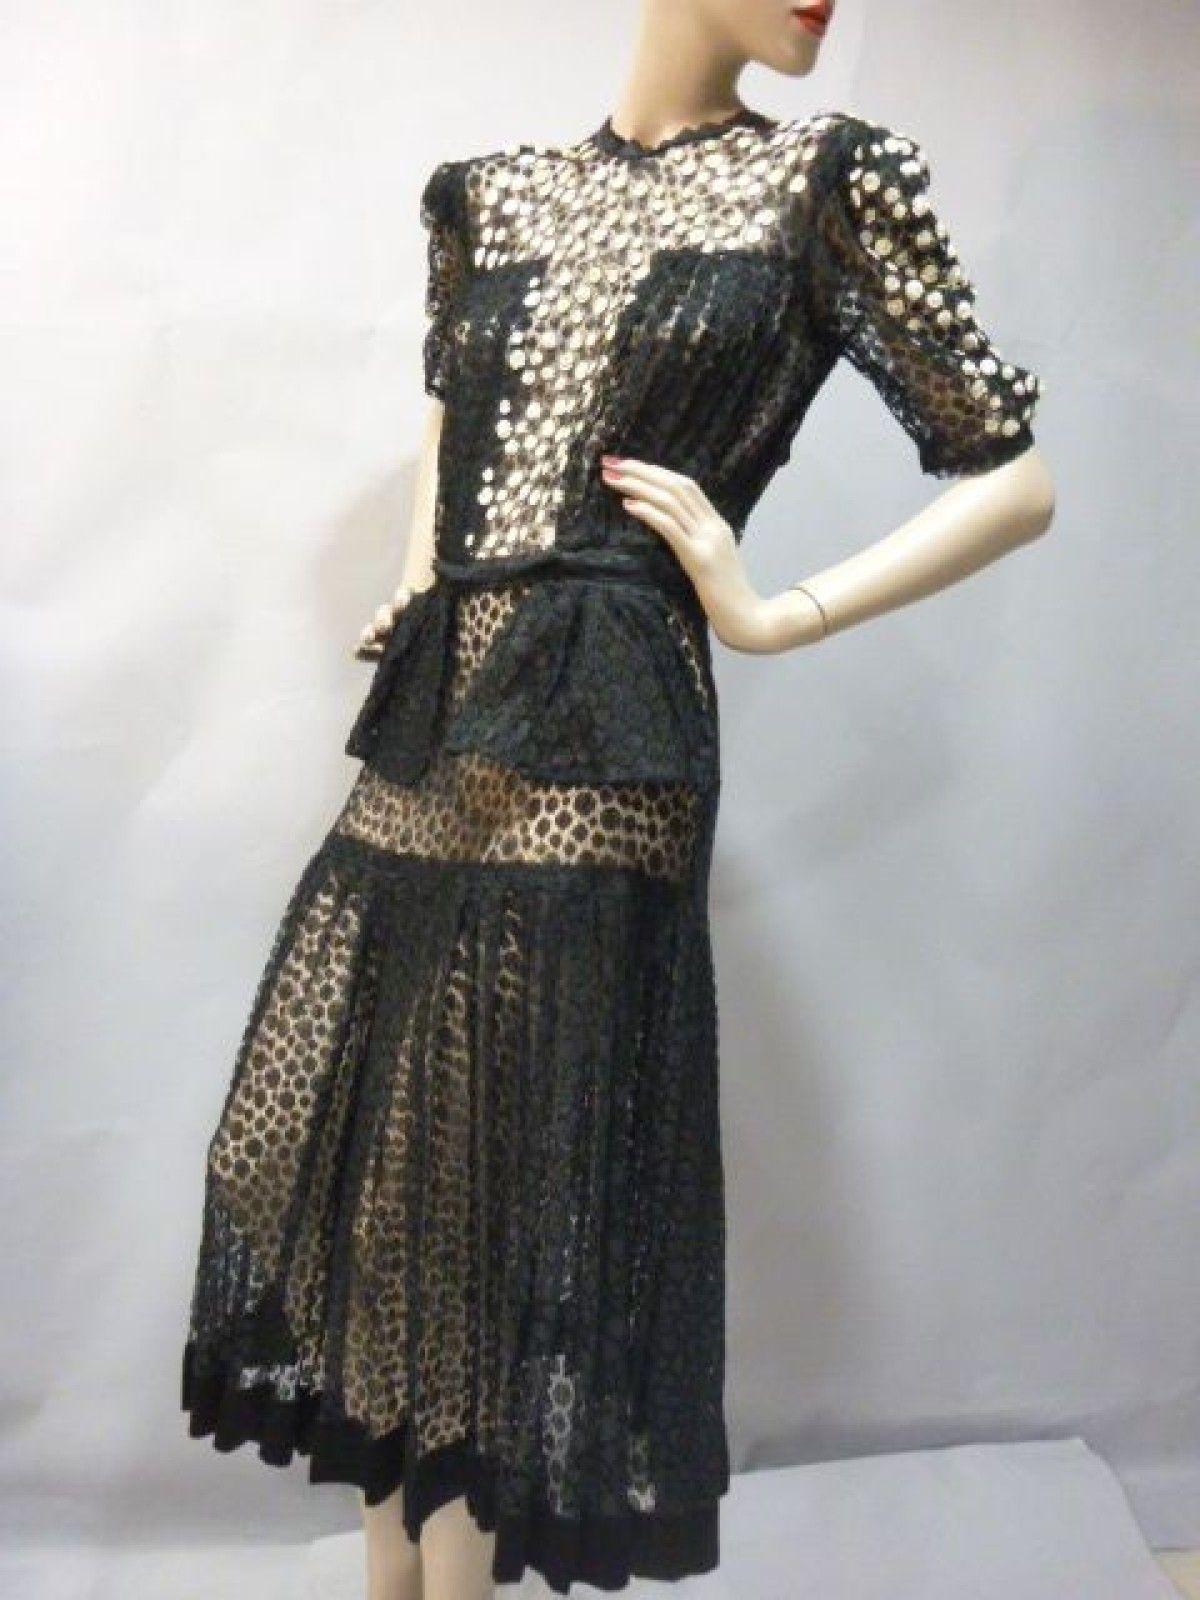 1940 Cocktail Dress - Thierry de Maigret | Needful things-Colour ...